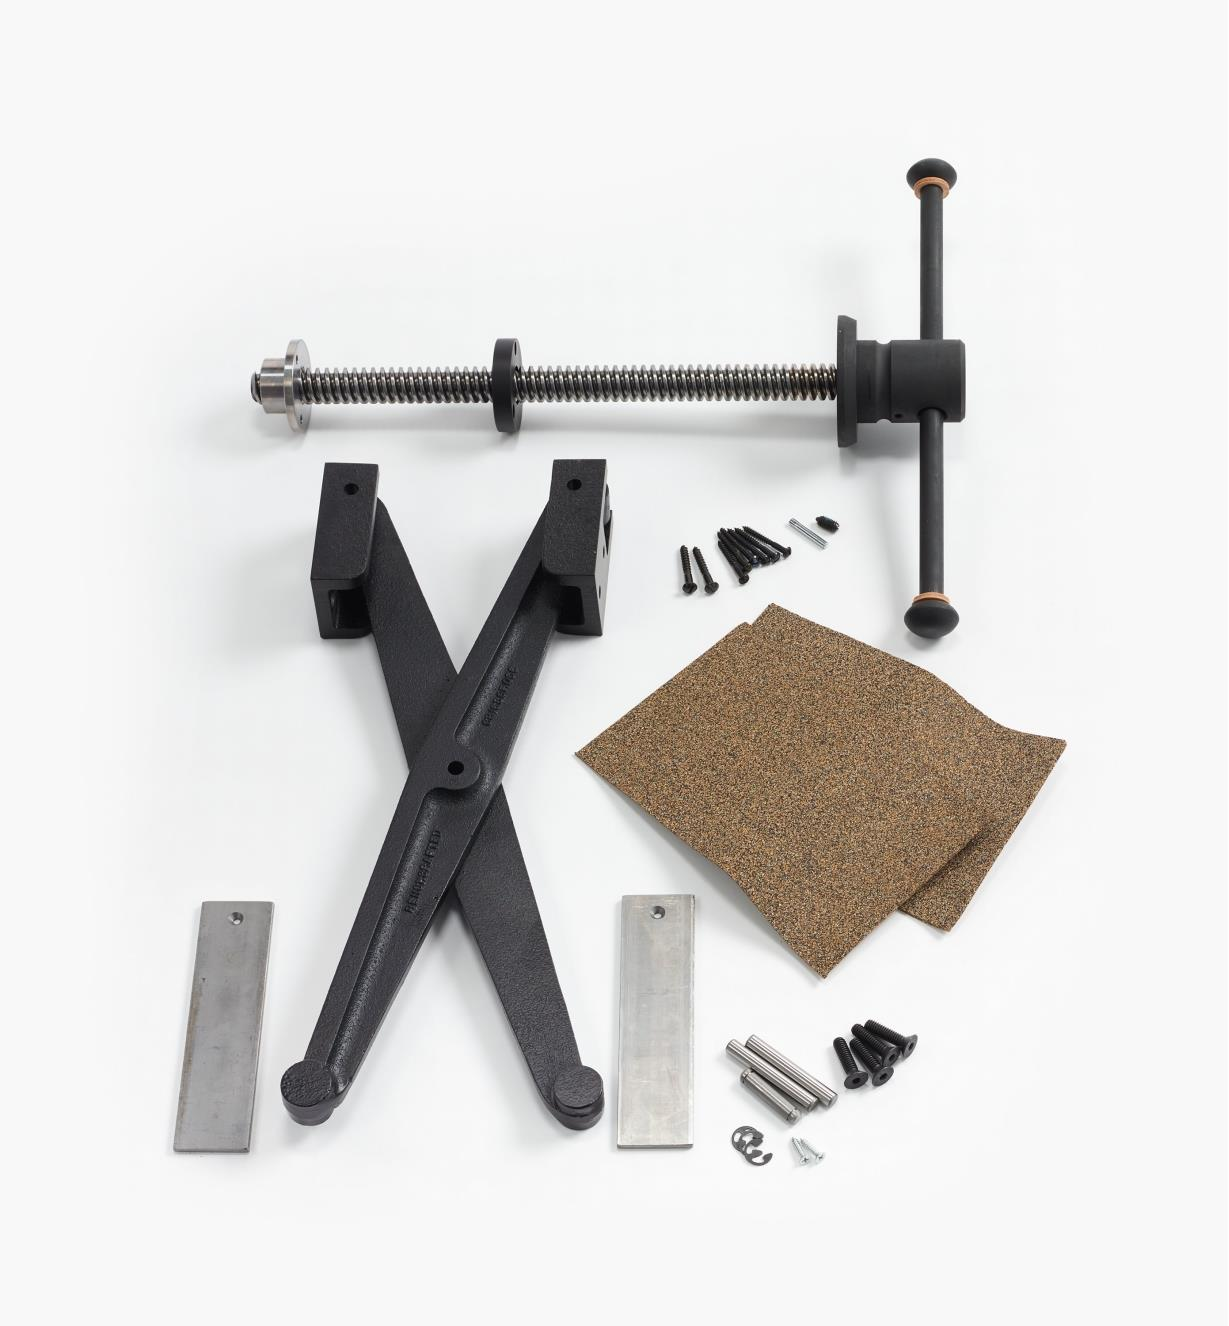 06G0162 - Ensemble Criscross Retro pour presse verticale parallèle Benchcrafted